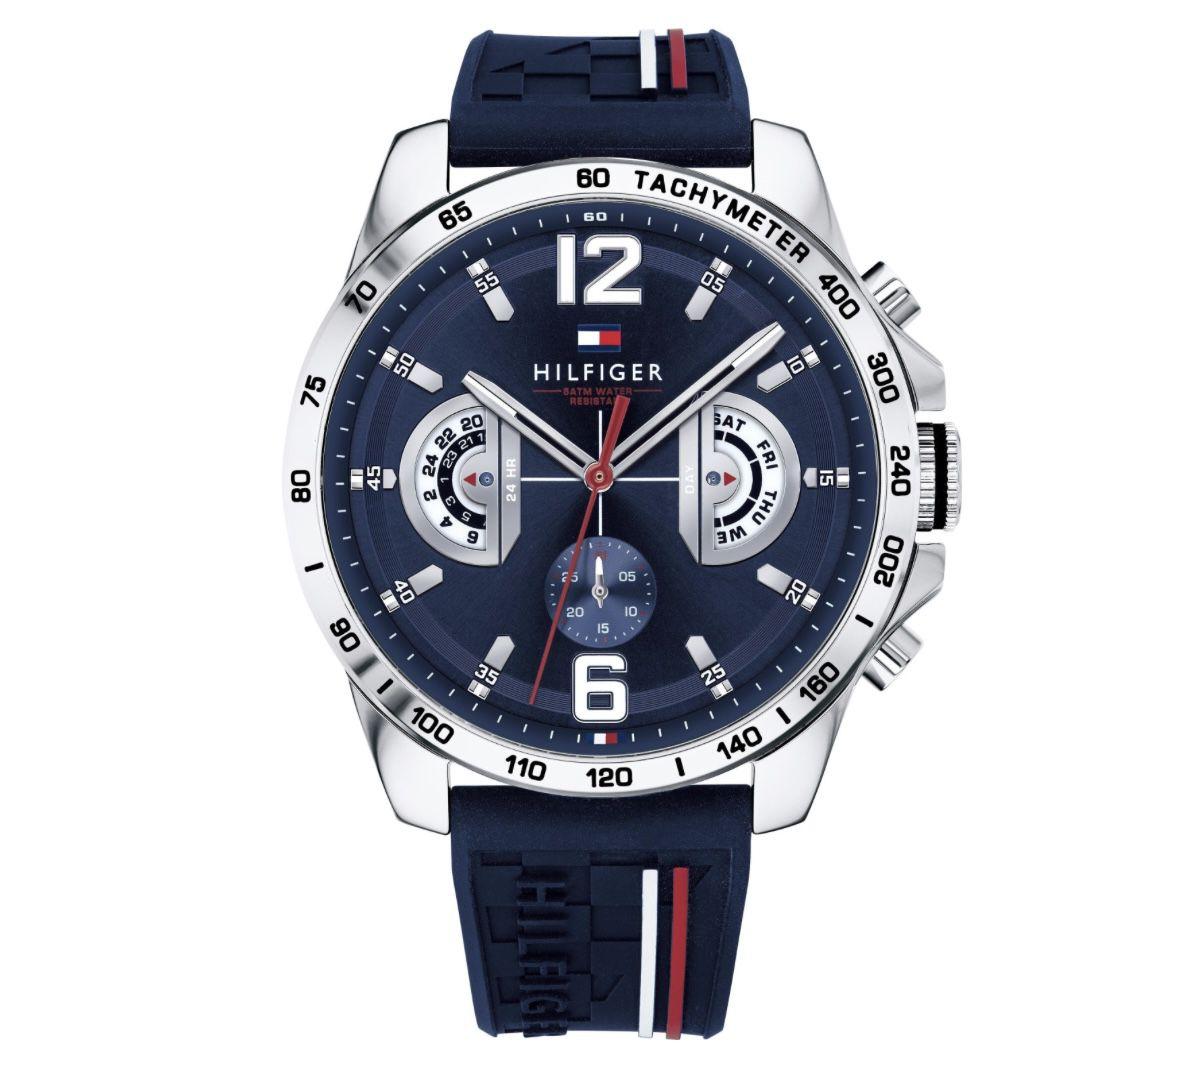 Tommy Hilfiger Unisex Multi-Zifferblatt Quarz Uhr mit Silikonarmband für 90,56€ (statt 109€)